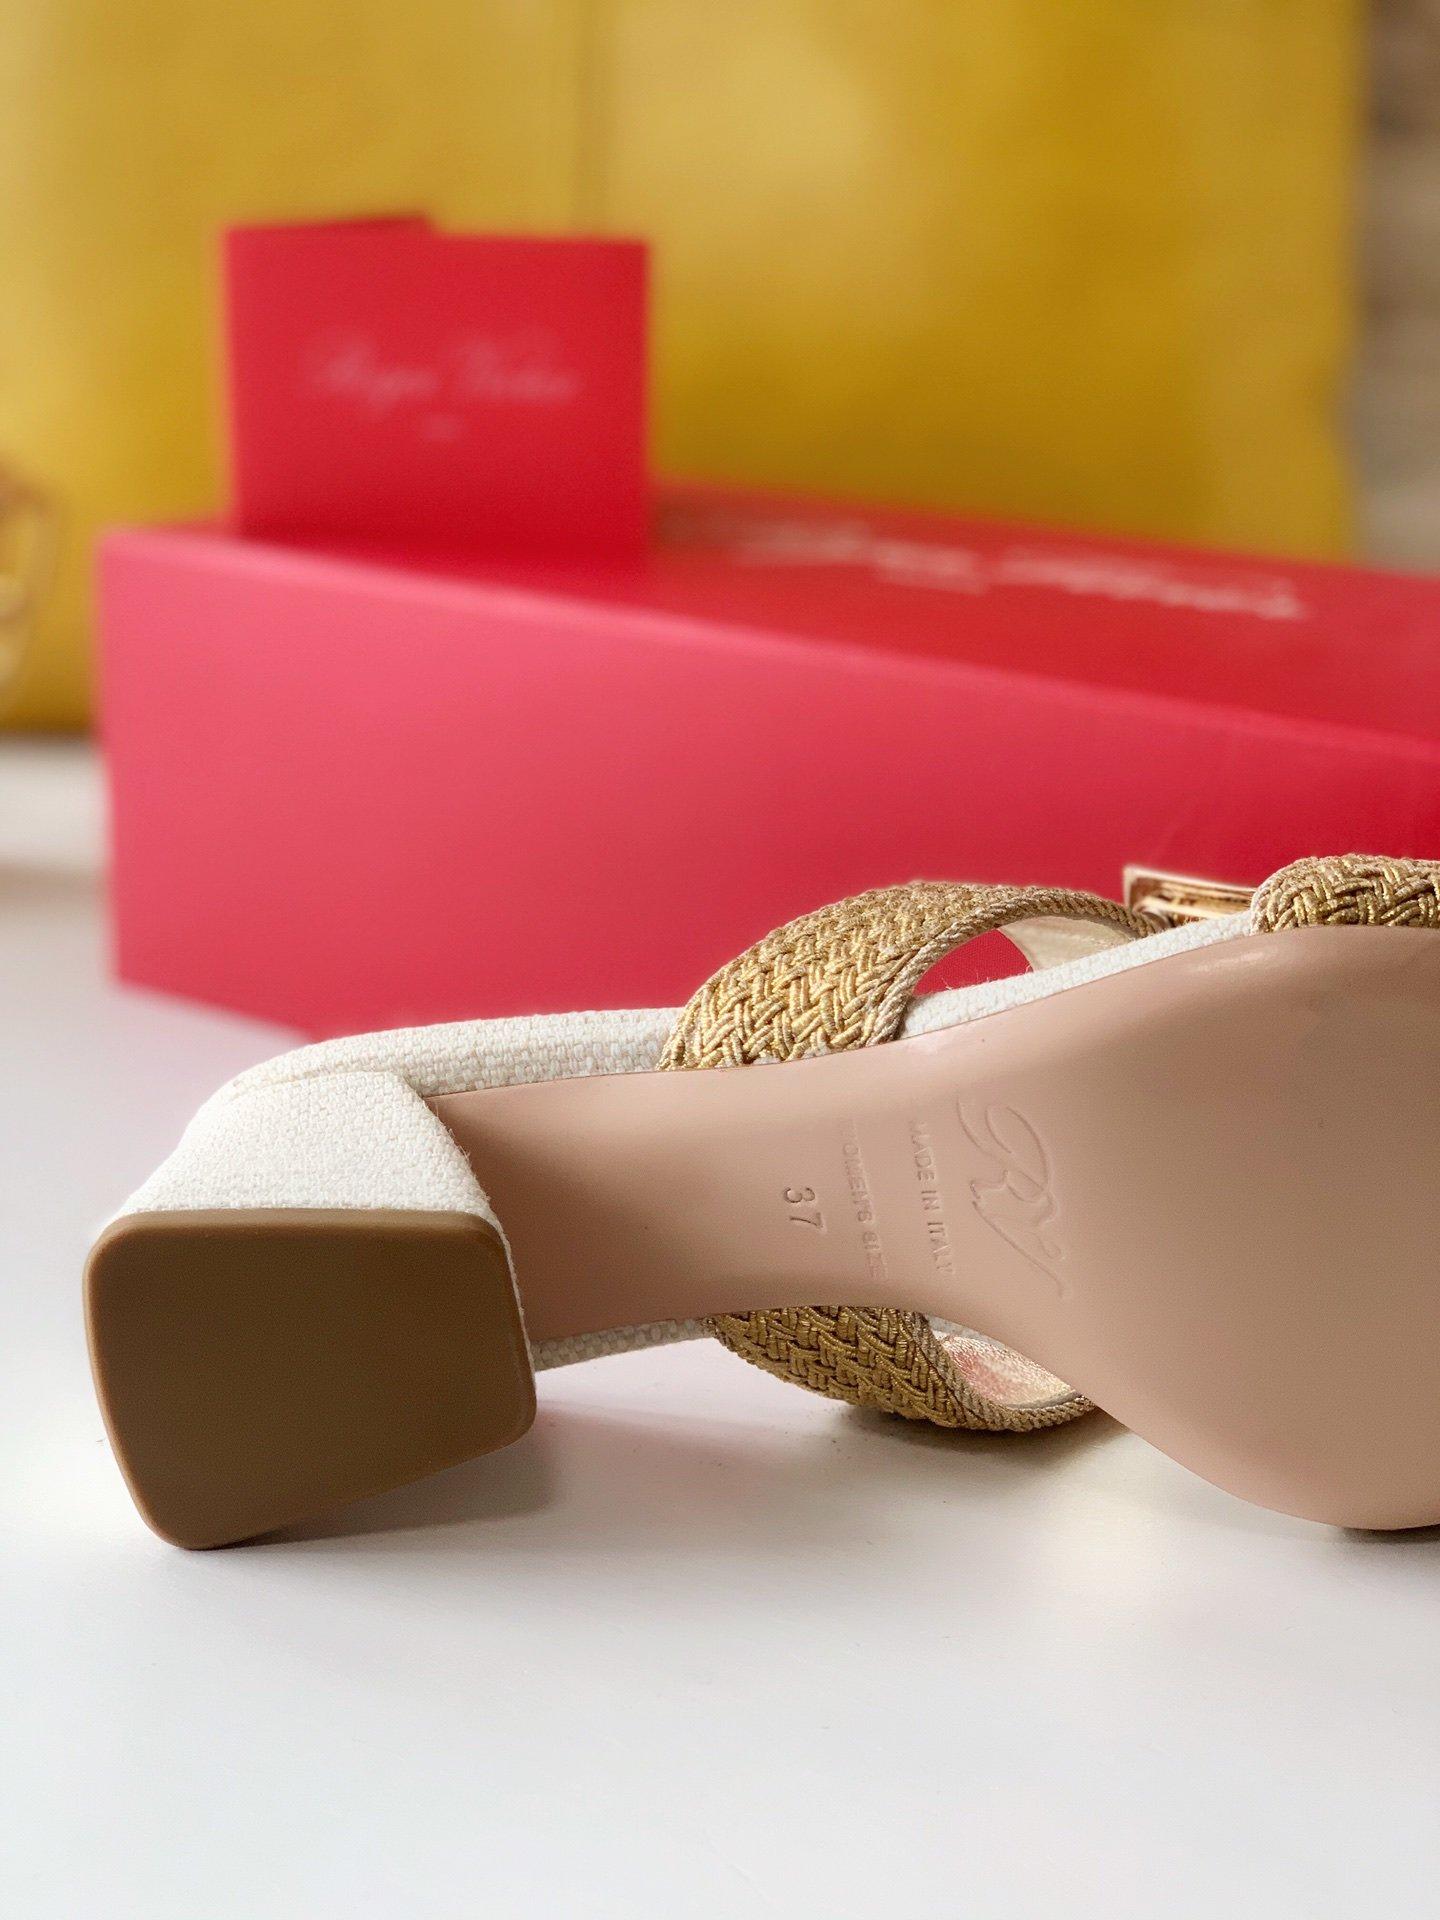 Roger Vivier编织穆勒鞋金属扣粗喇叭跟亚麻编织(图9)